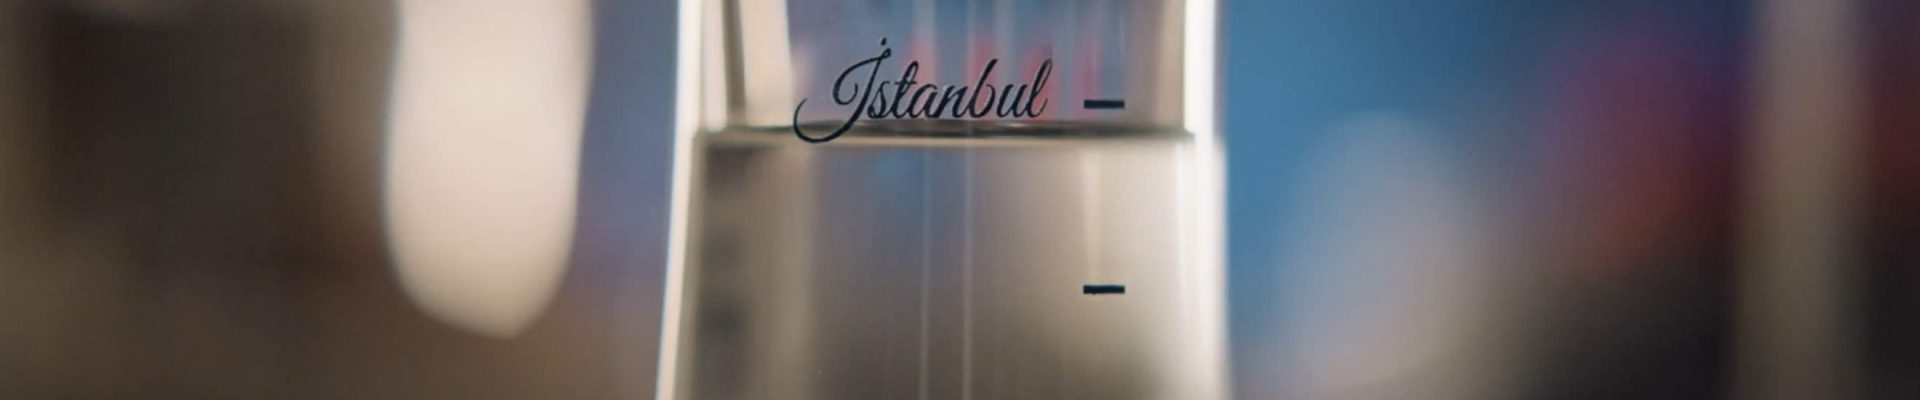 yeni-raki-reklami-burasi-istanbul-reklami-turkiyenin-reklamlari-raki-icki-bira-sarap-votka